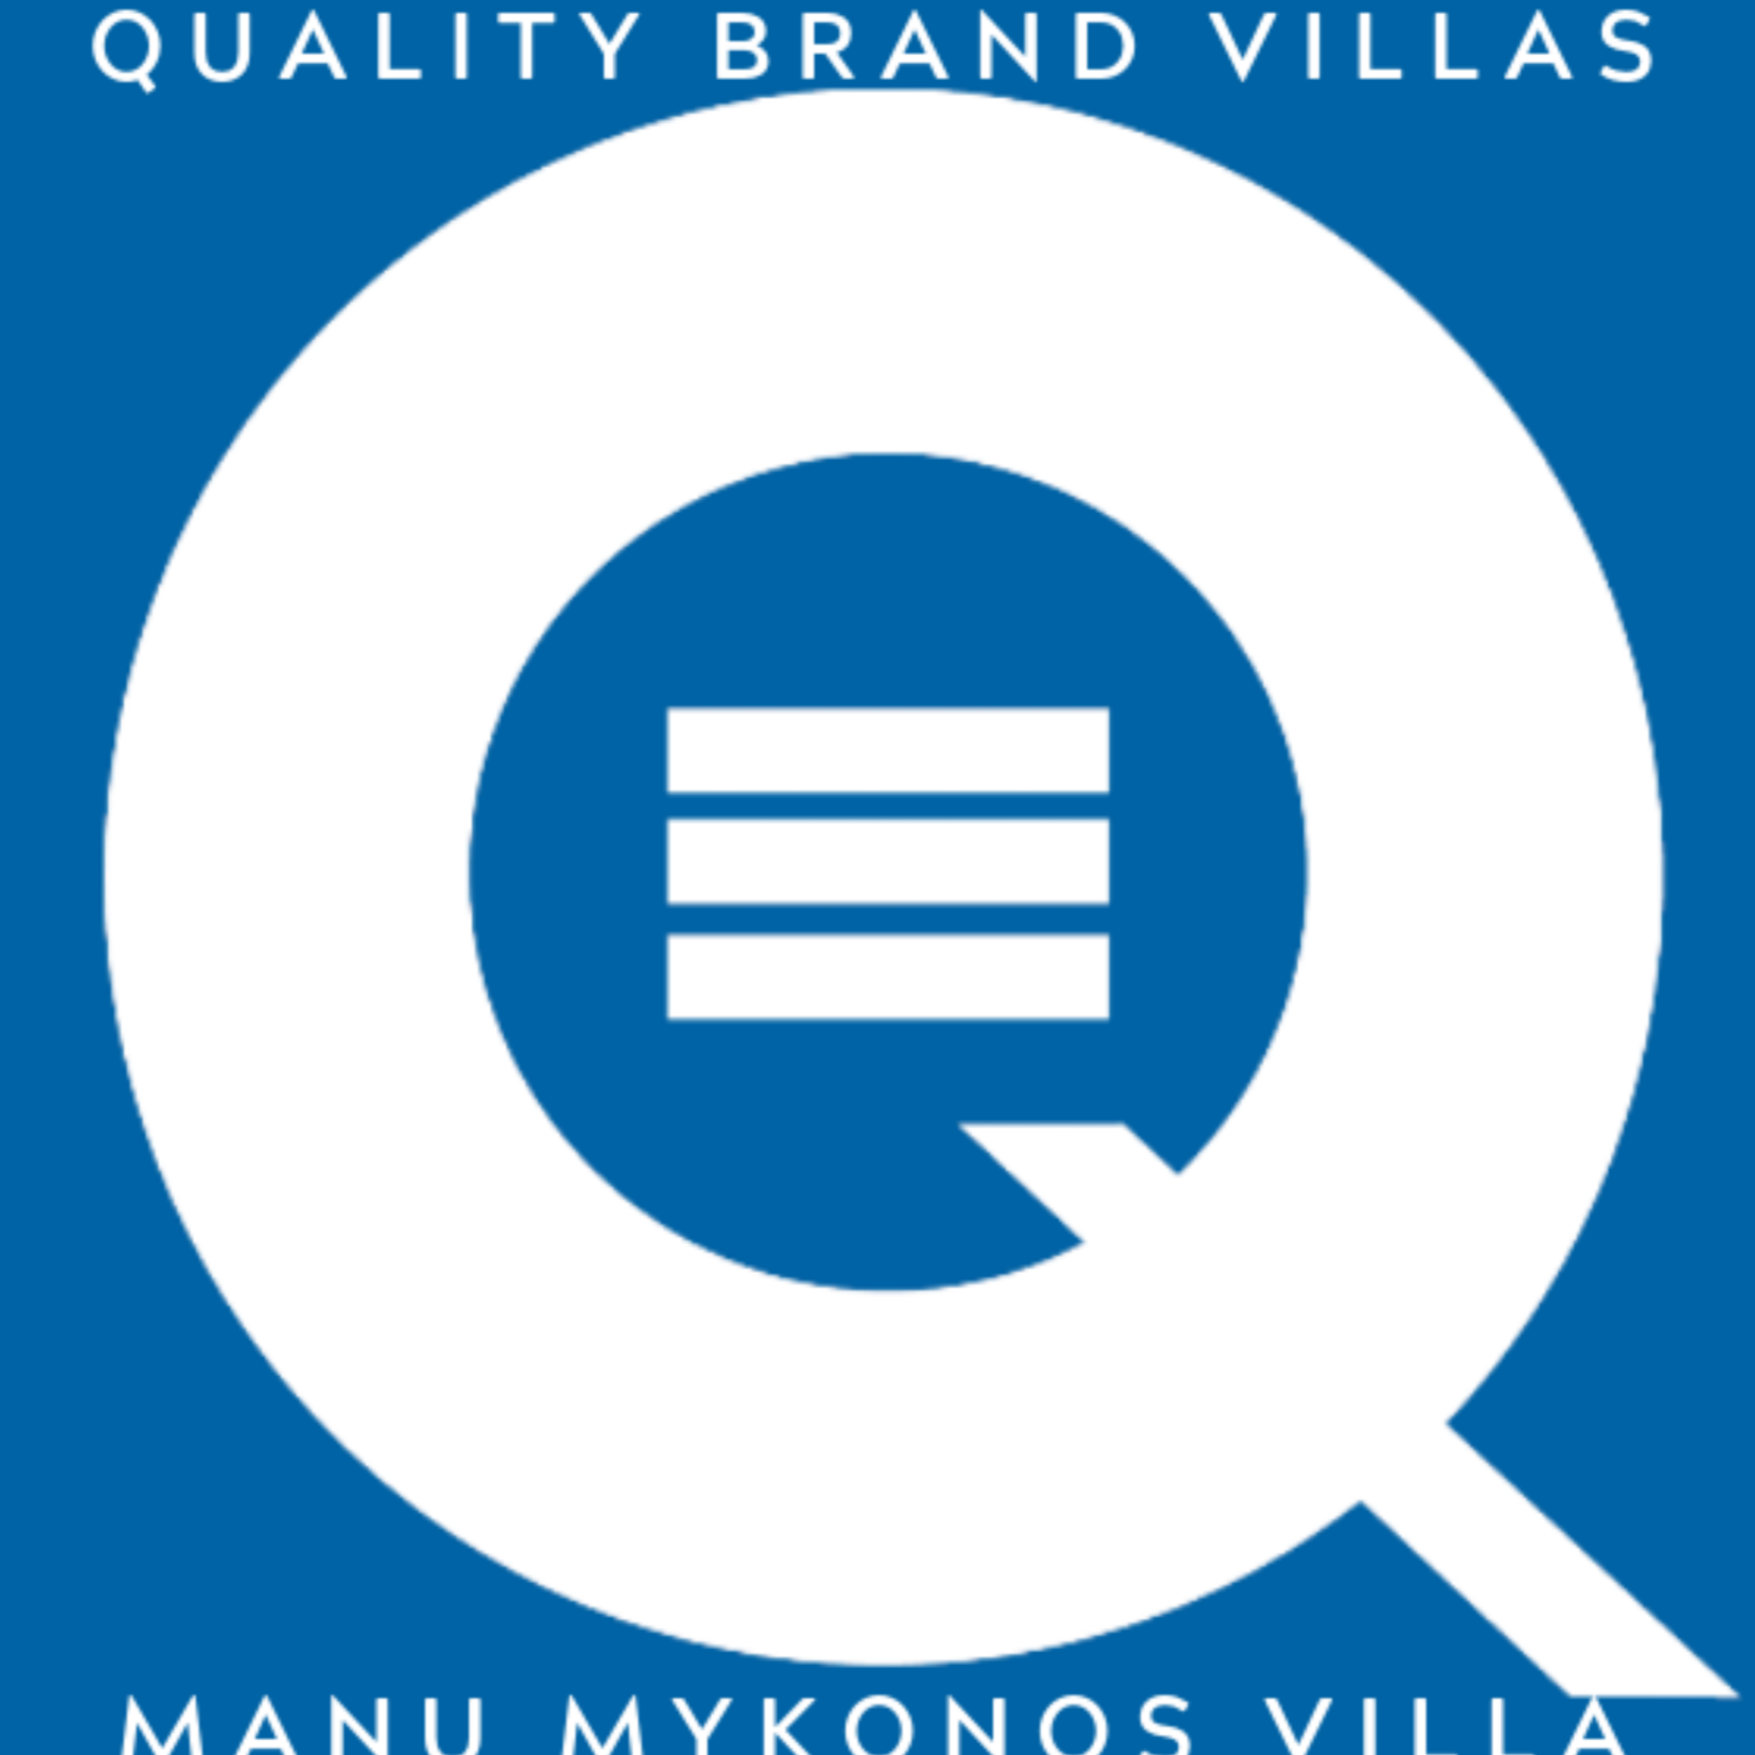 20 quality brand villas